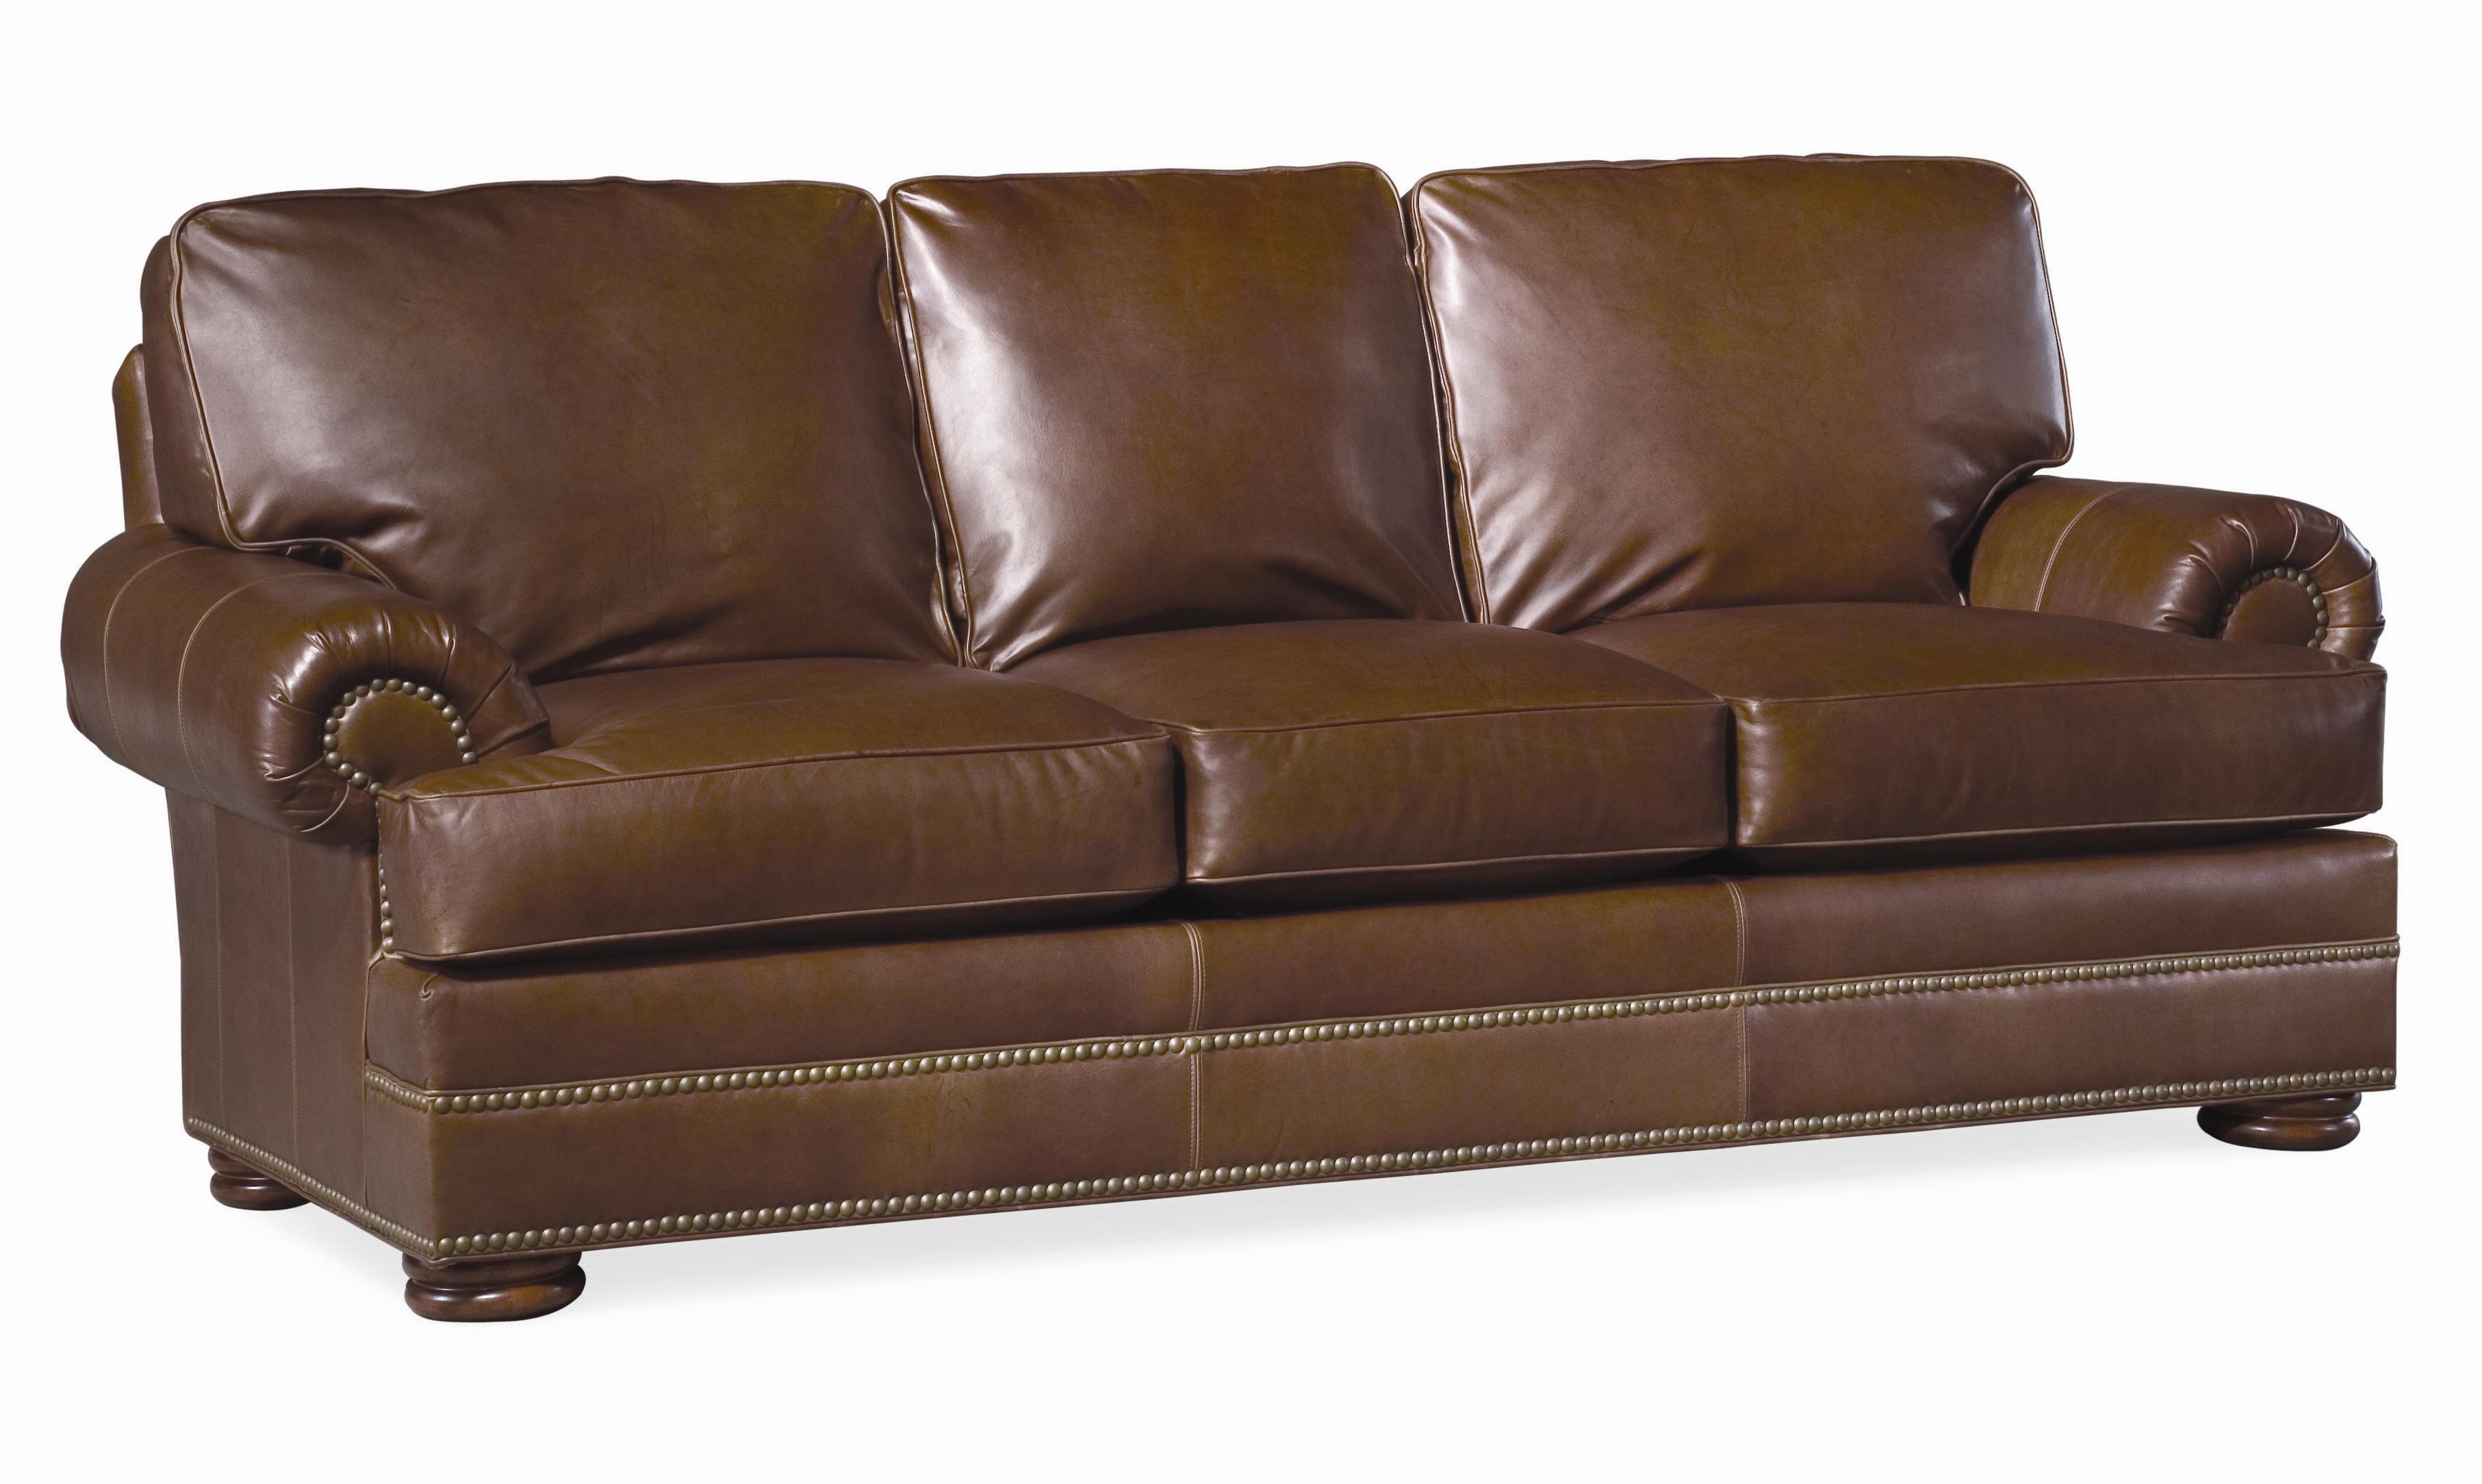 thomasville reclining sofa large corner sofas northern ireland leather prices waco temple